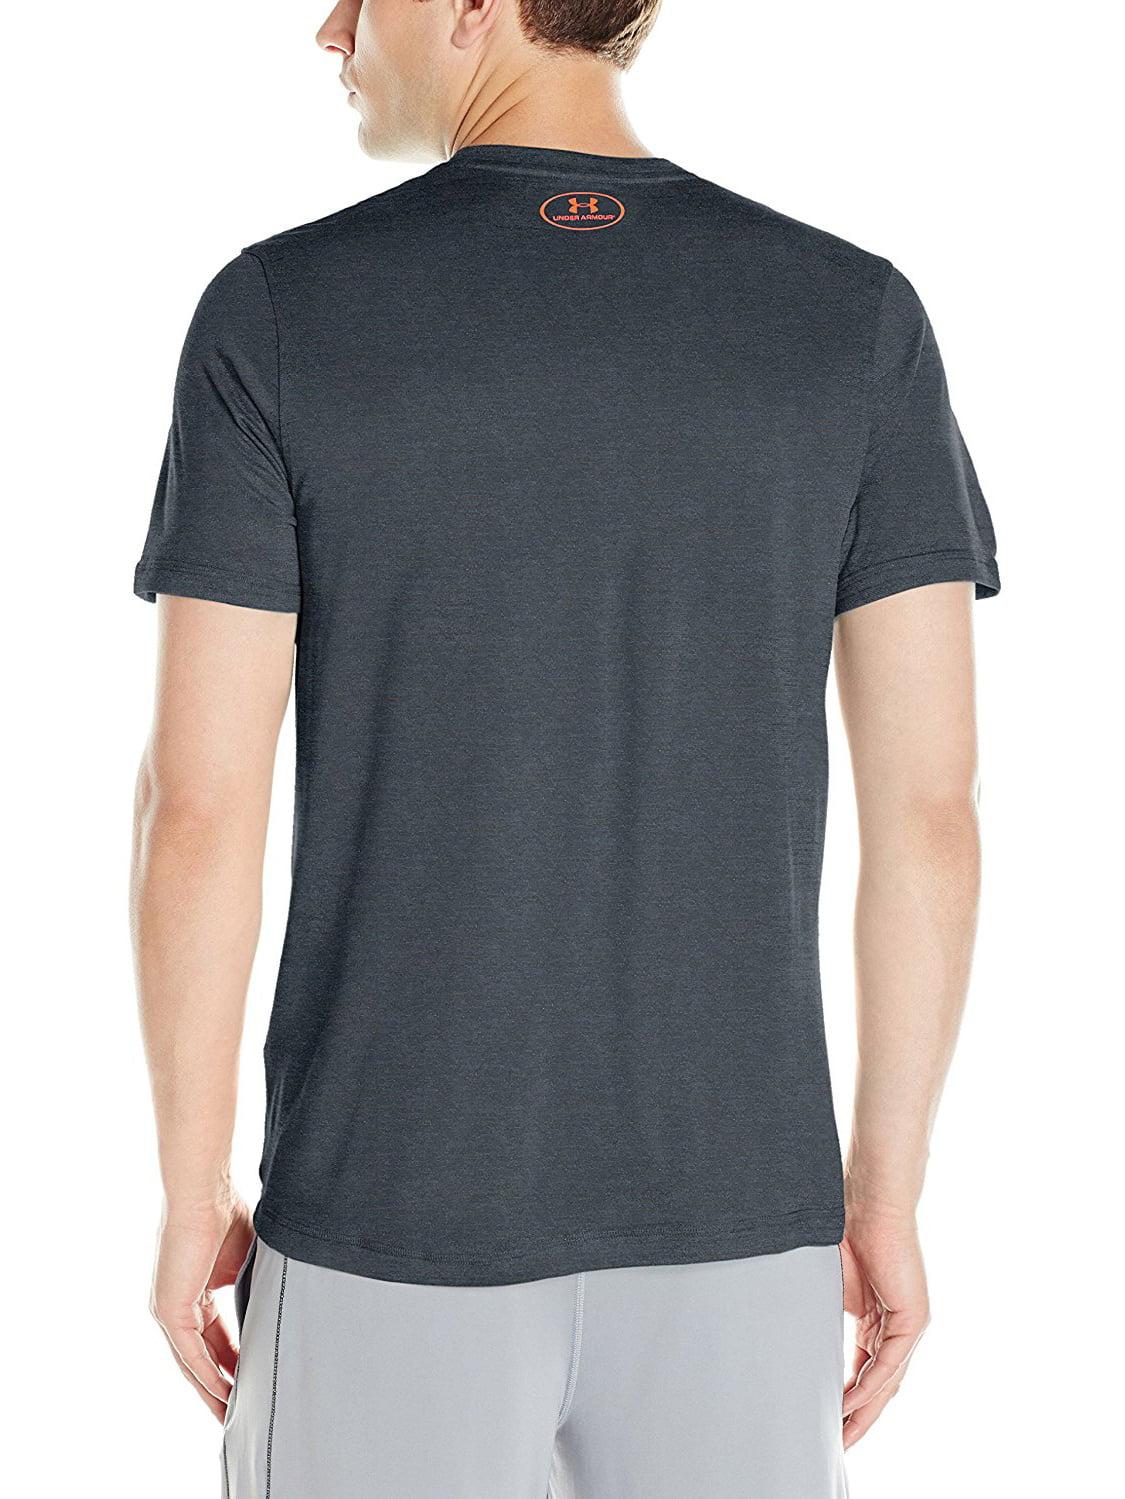 Under Armour Men/'s UA Tech V-Neck Short Sleeve T-Shirt Midnight Navy Small